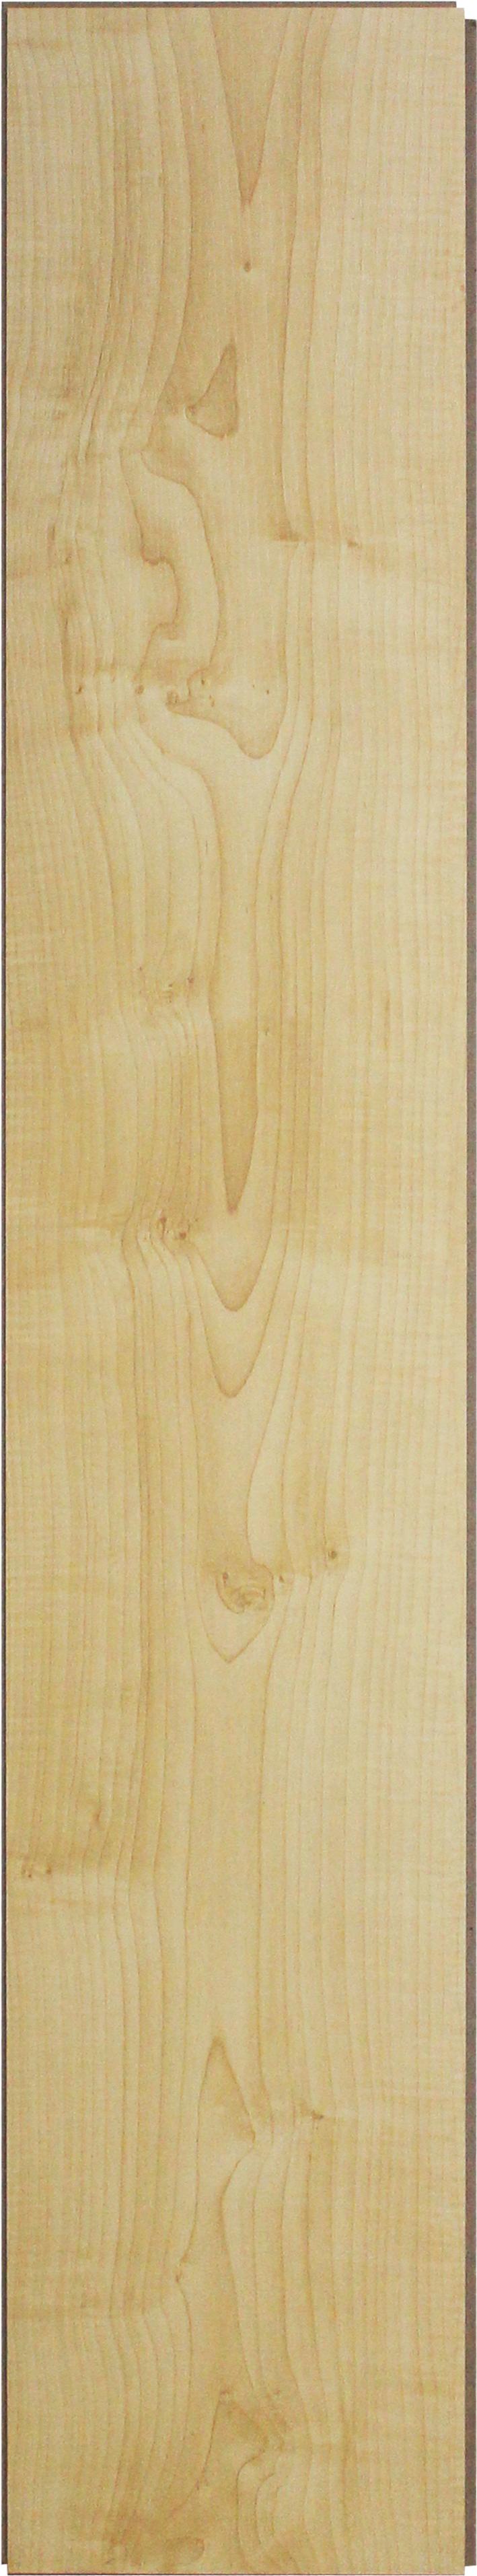 1301-Canadian Hard Maple